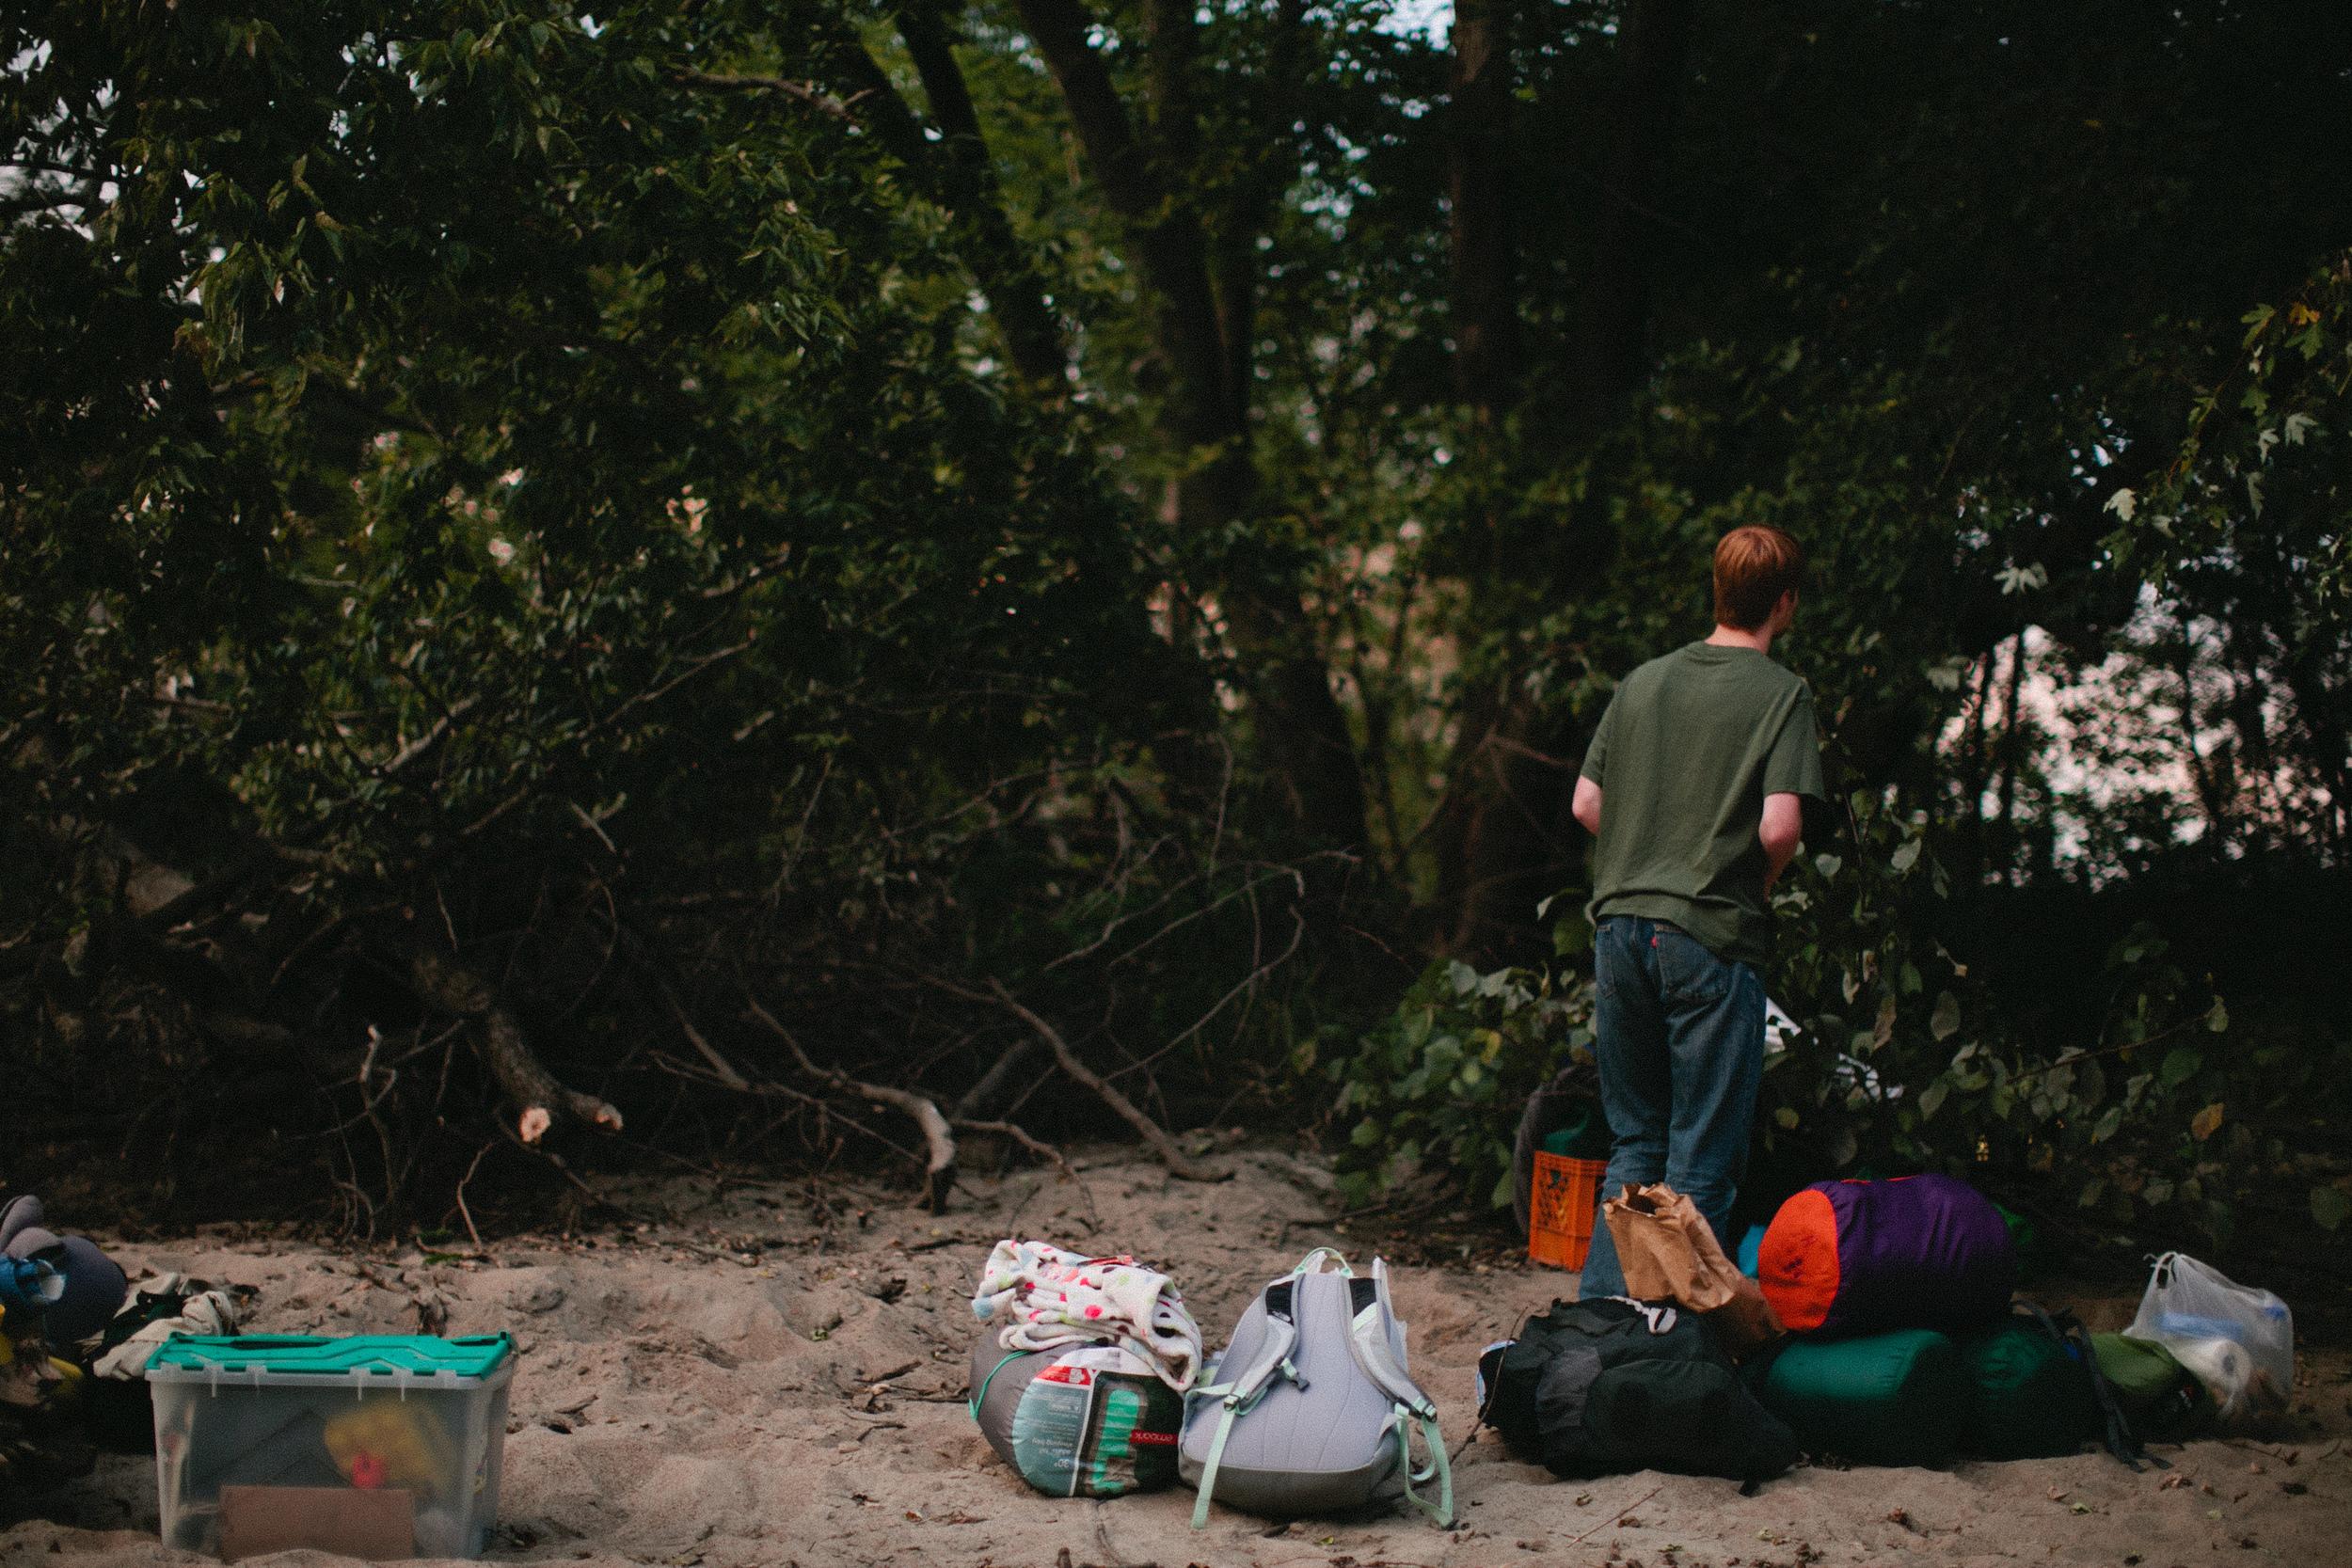 Camping-19.jpg